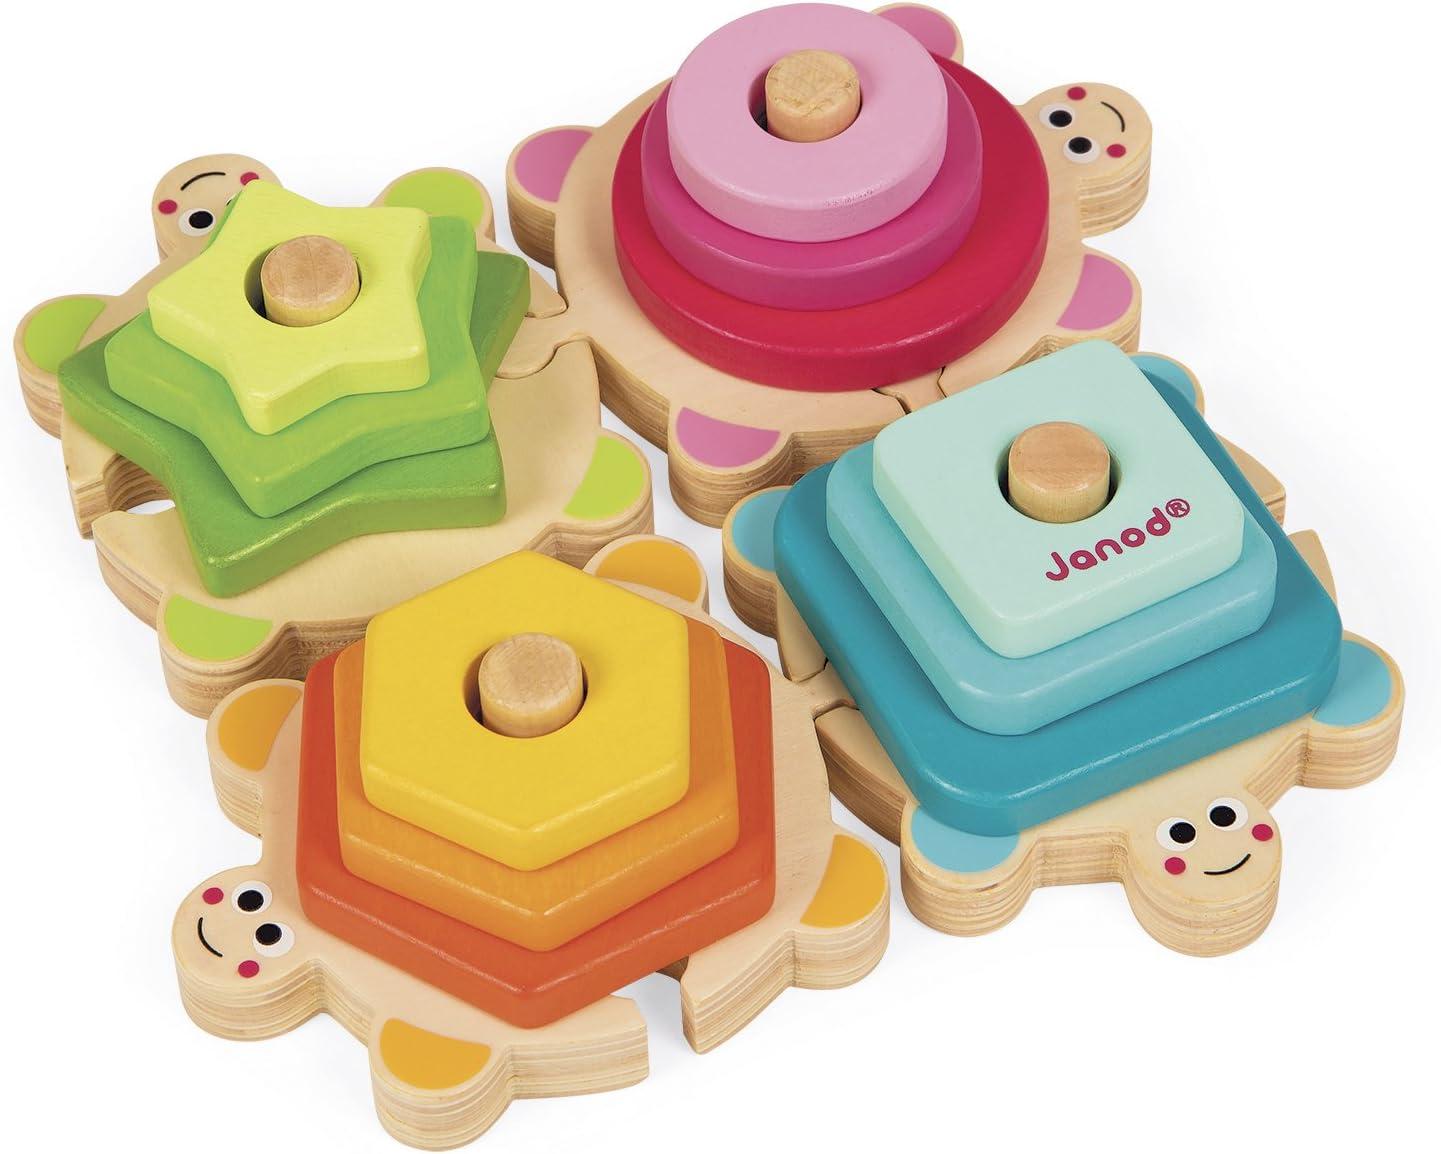 Janod - Tortugas apilables I Wood (J05337): Amazon.es: Juguetes y juegos